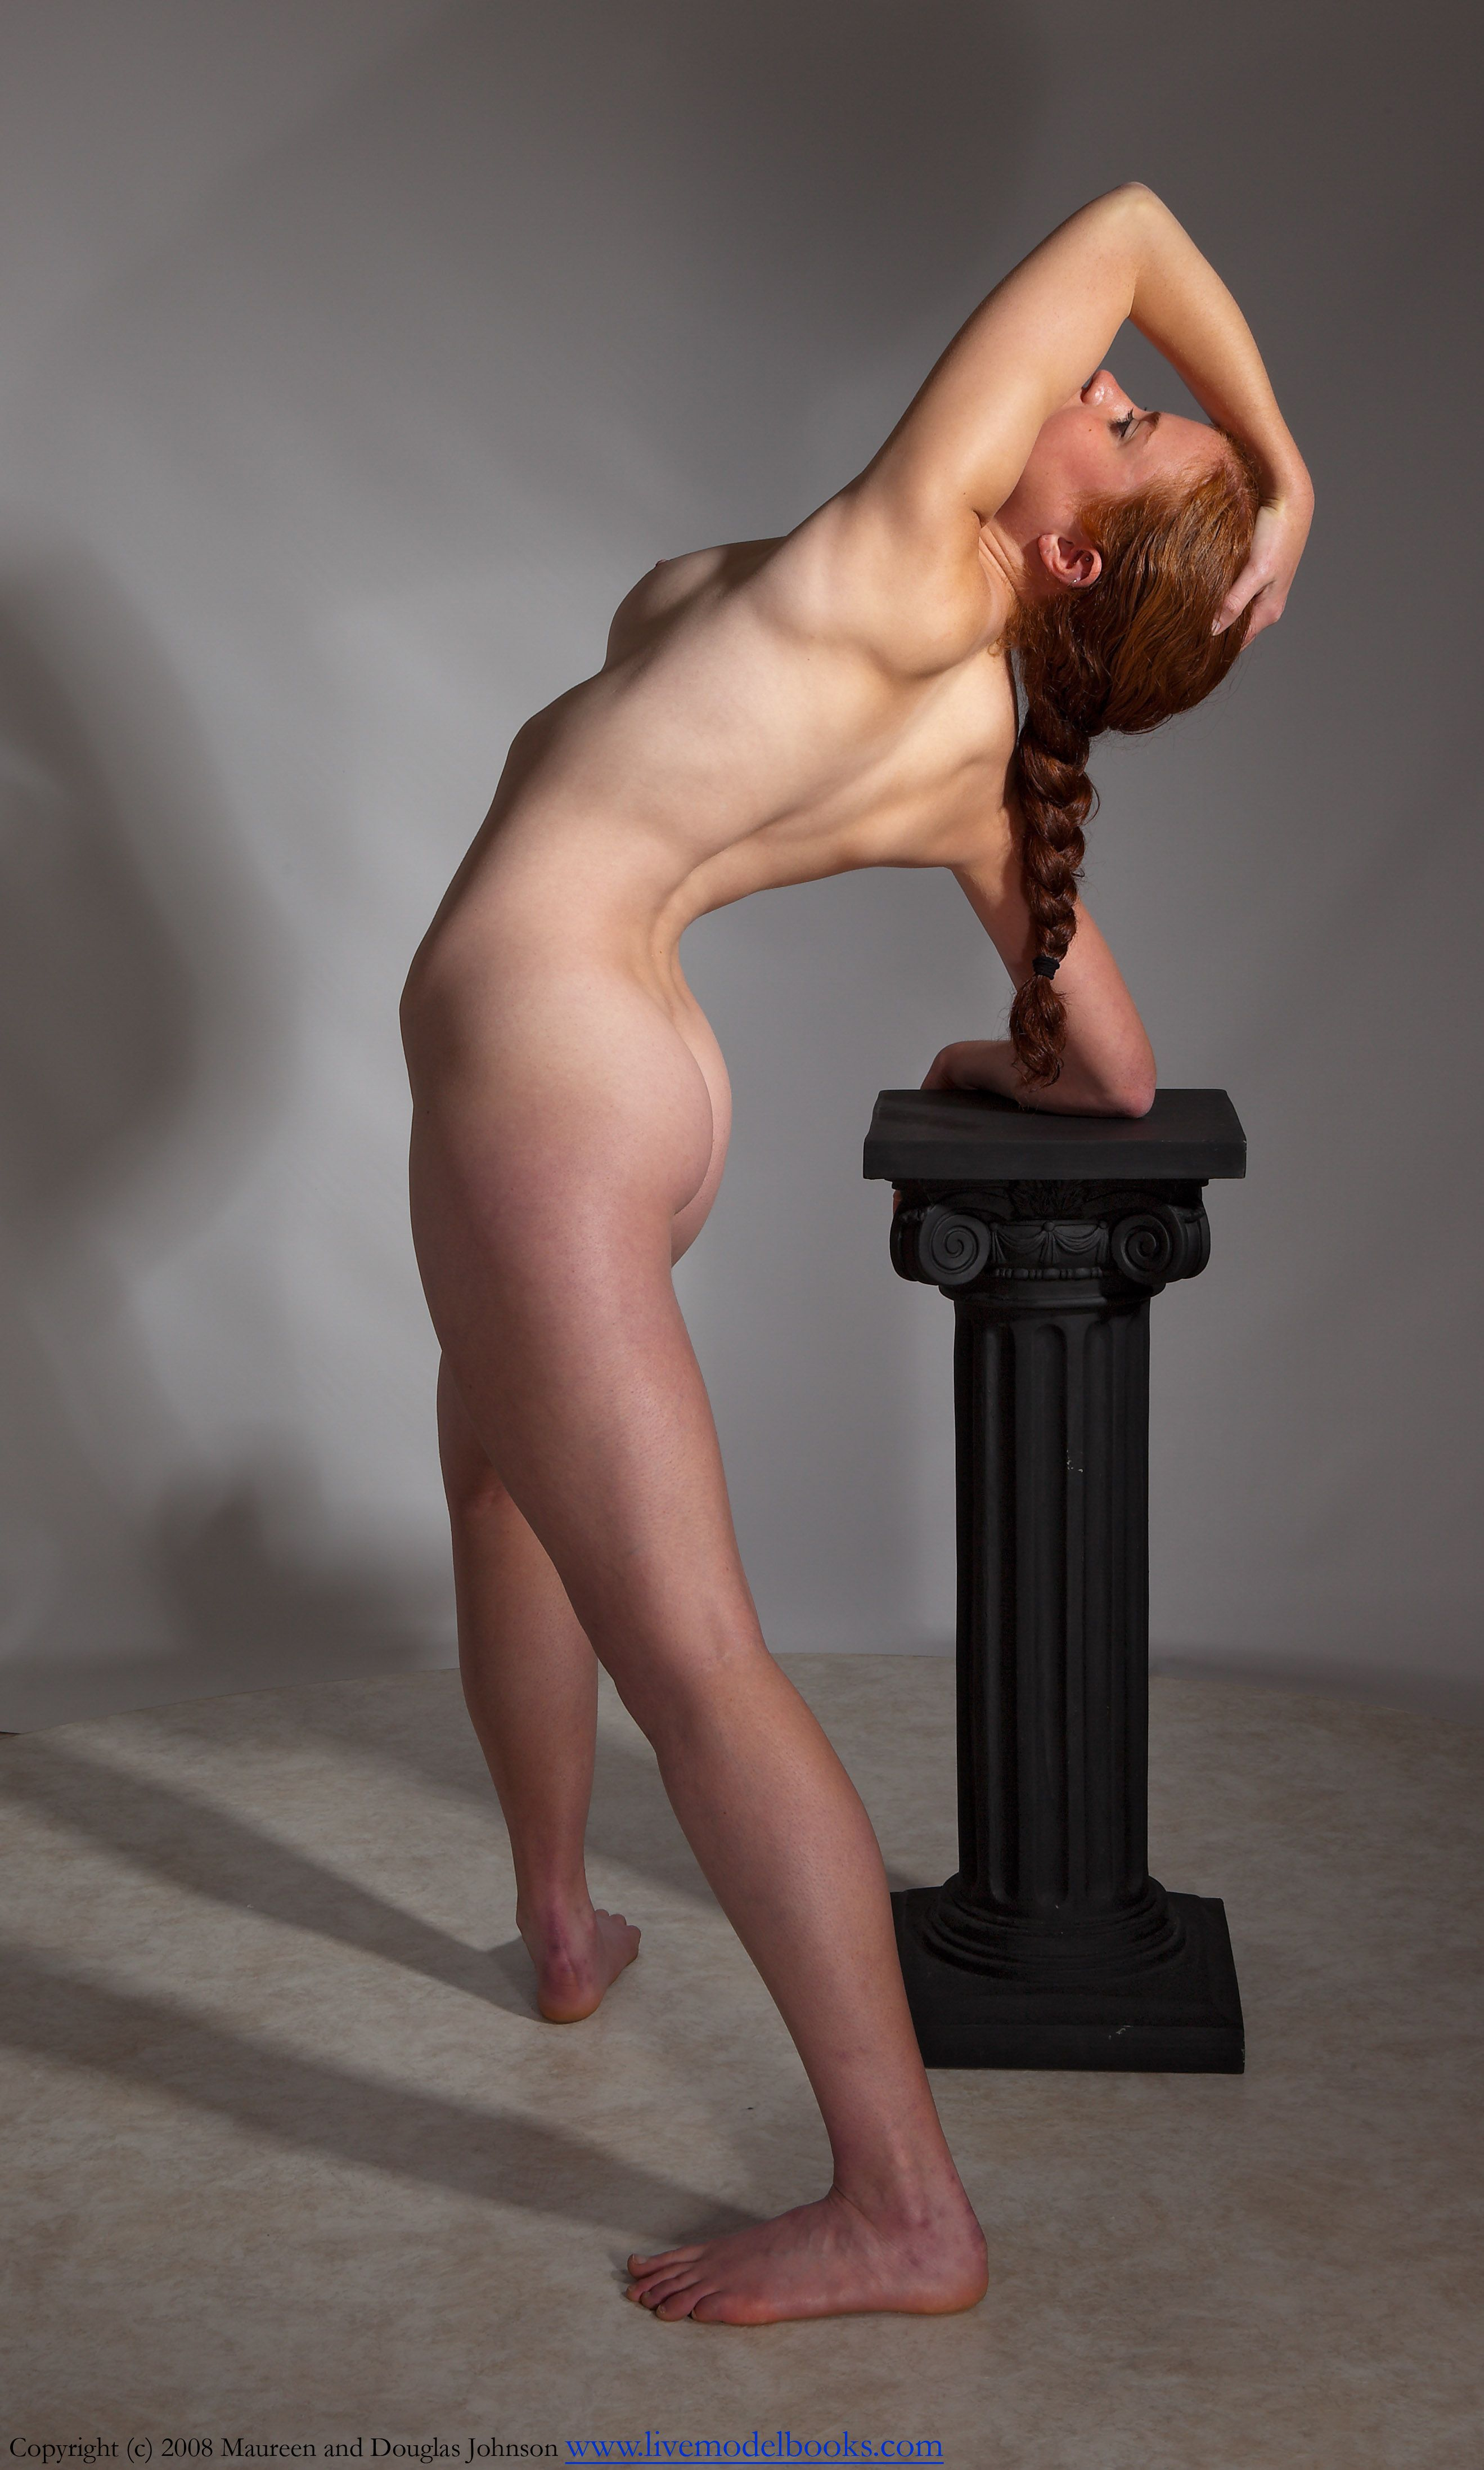 Nude models in sex pose xxx scenes